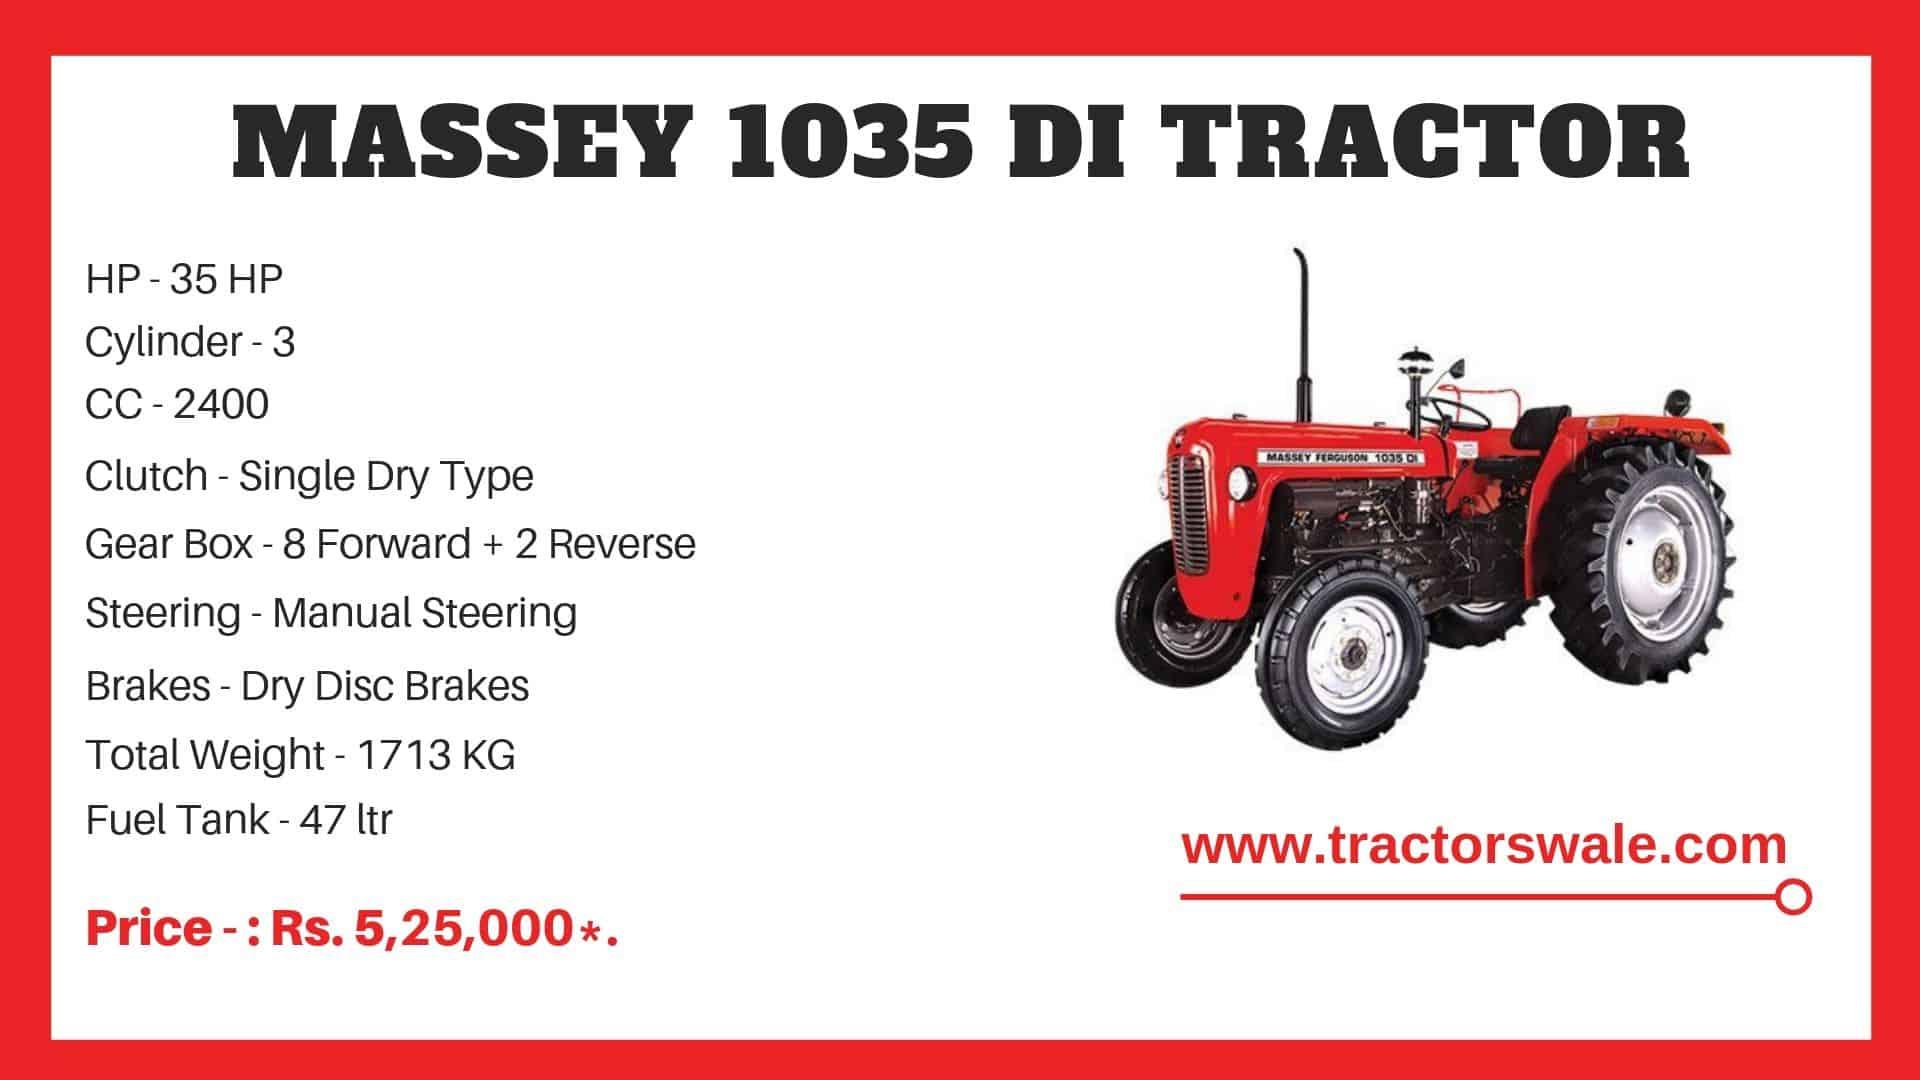 Massey Ferguson 1035 di Specifications